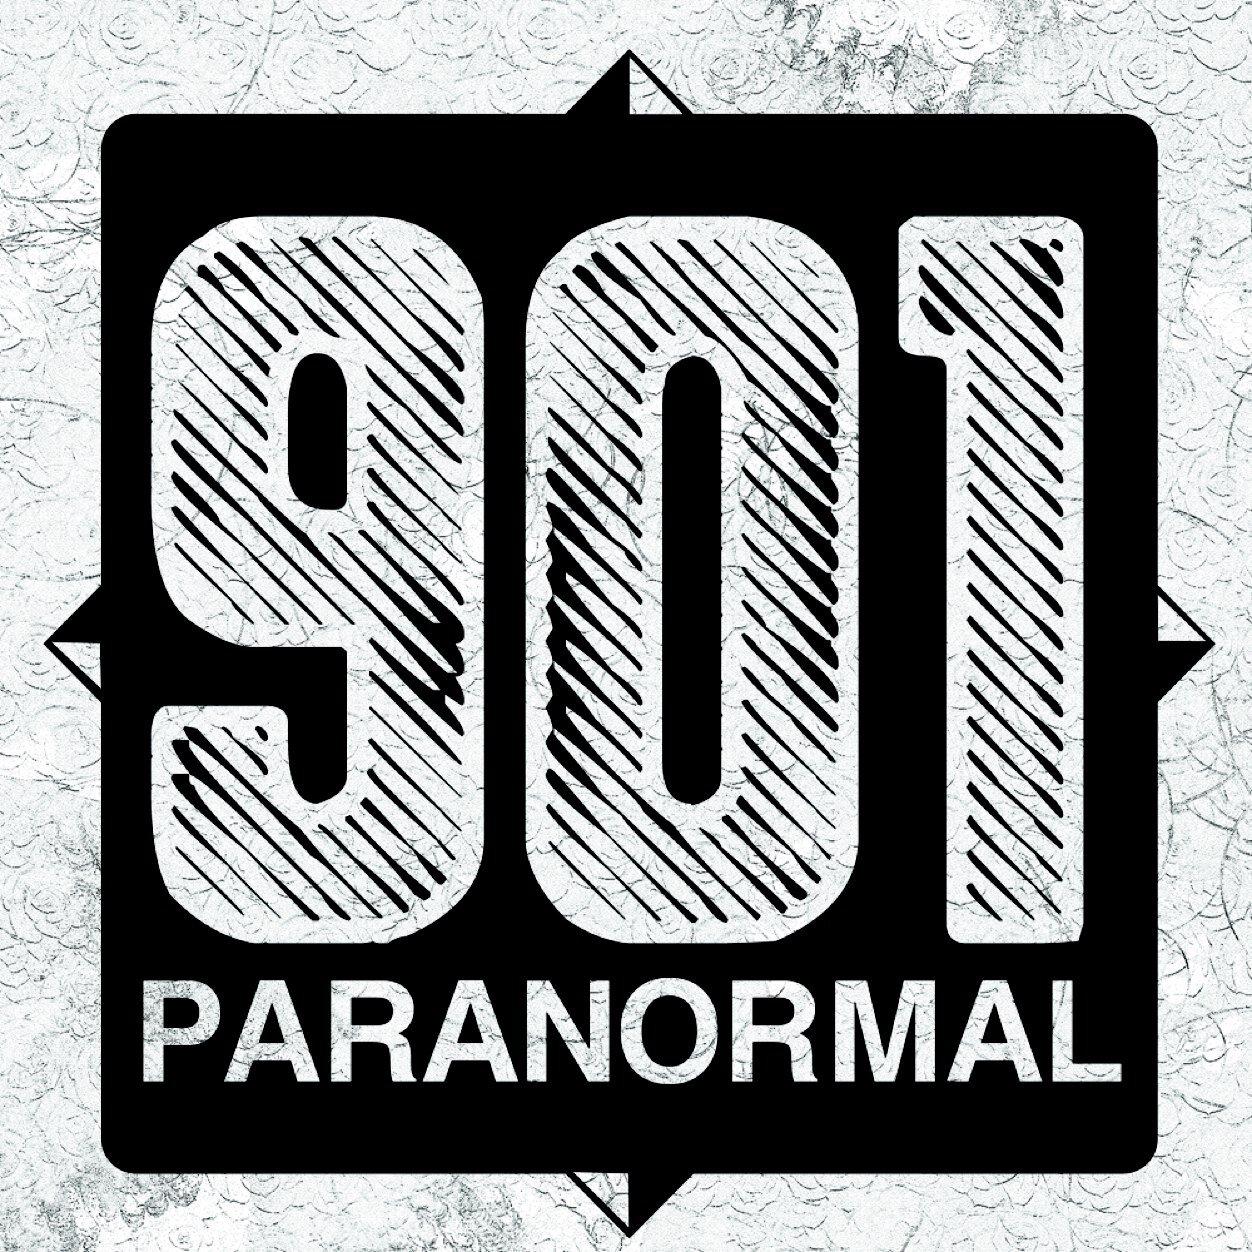 901 Paranormal